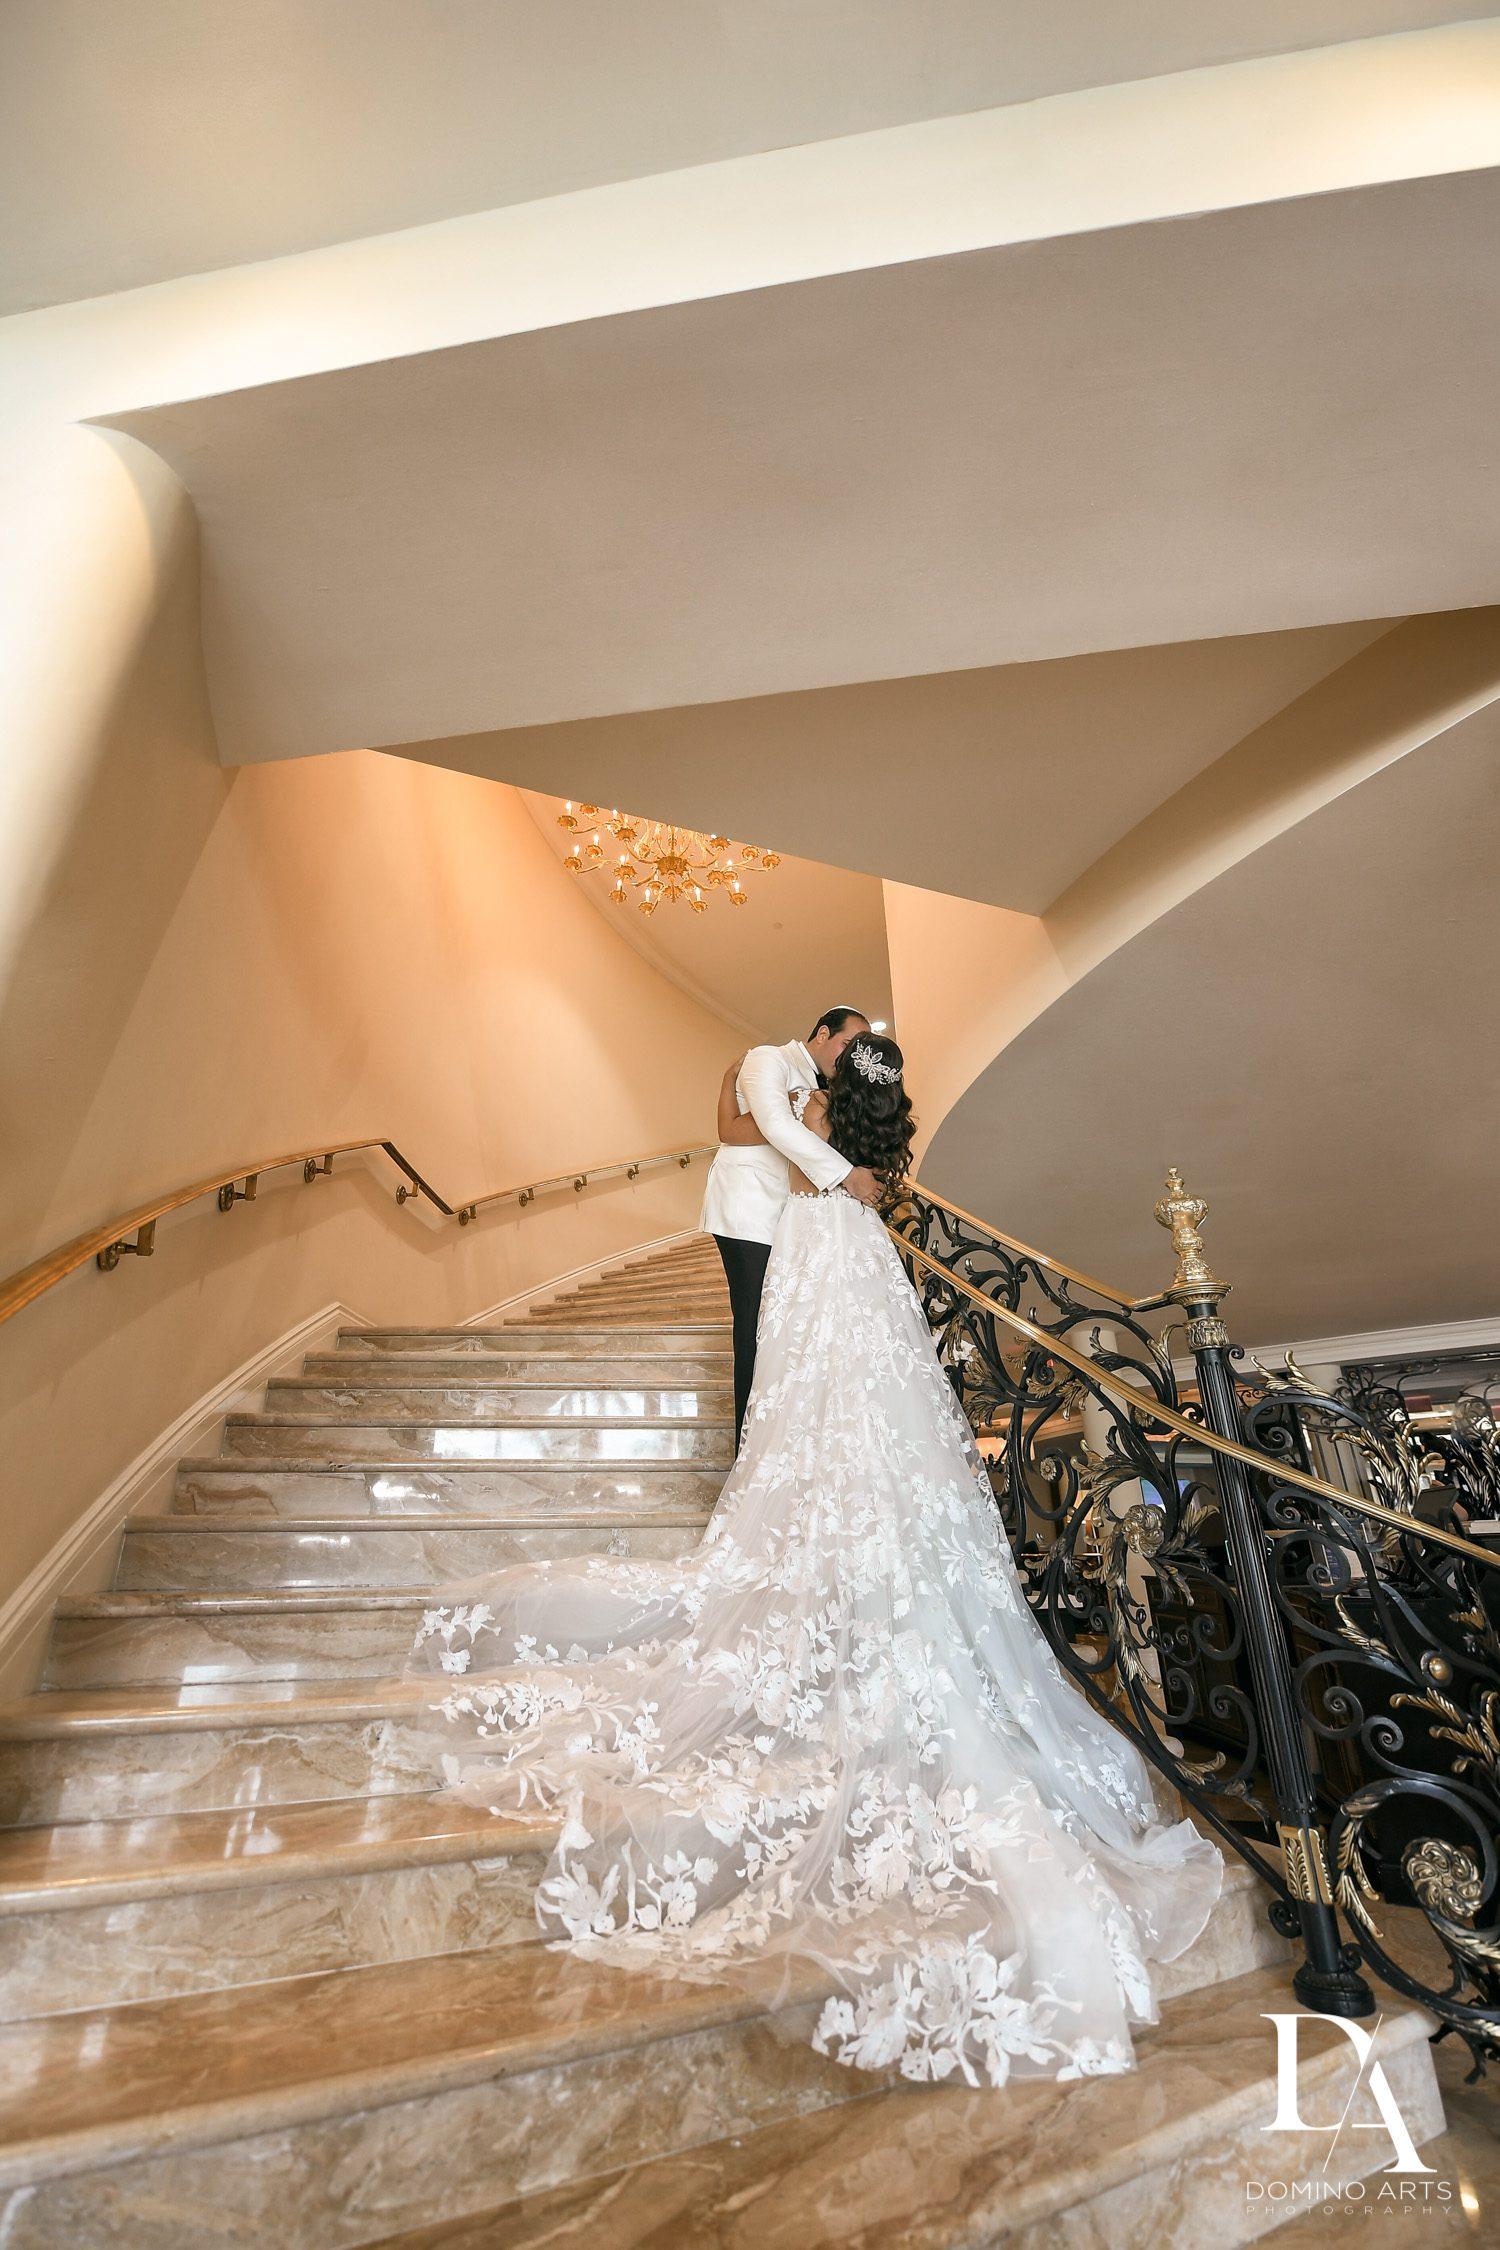 staircase at Elegant Classy Wedding at Trump Doral by Domino Arts Photography